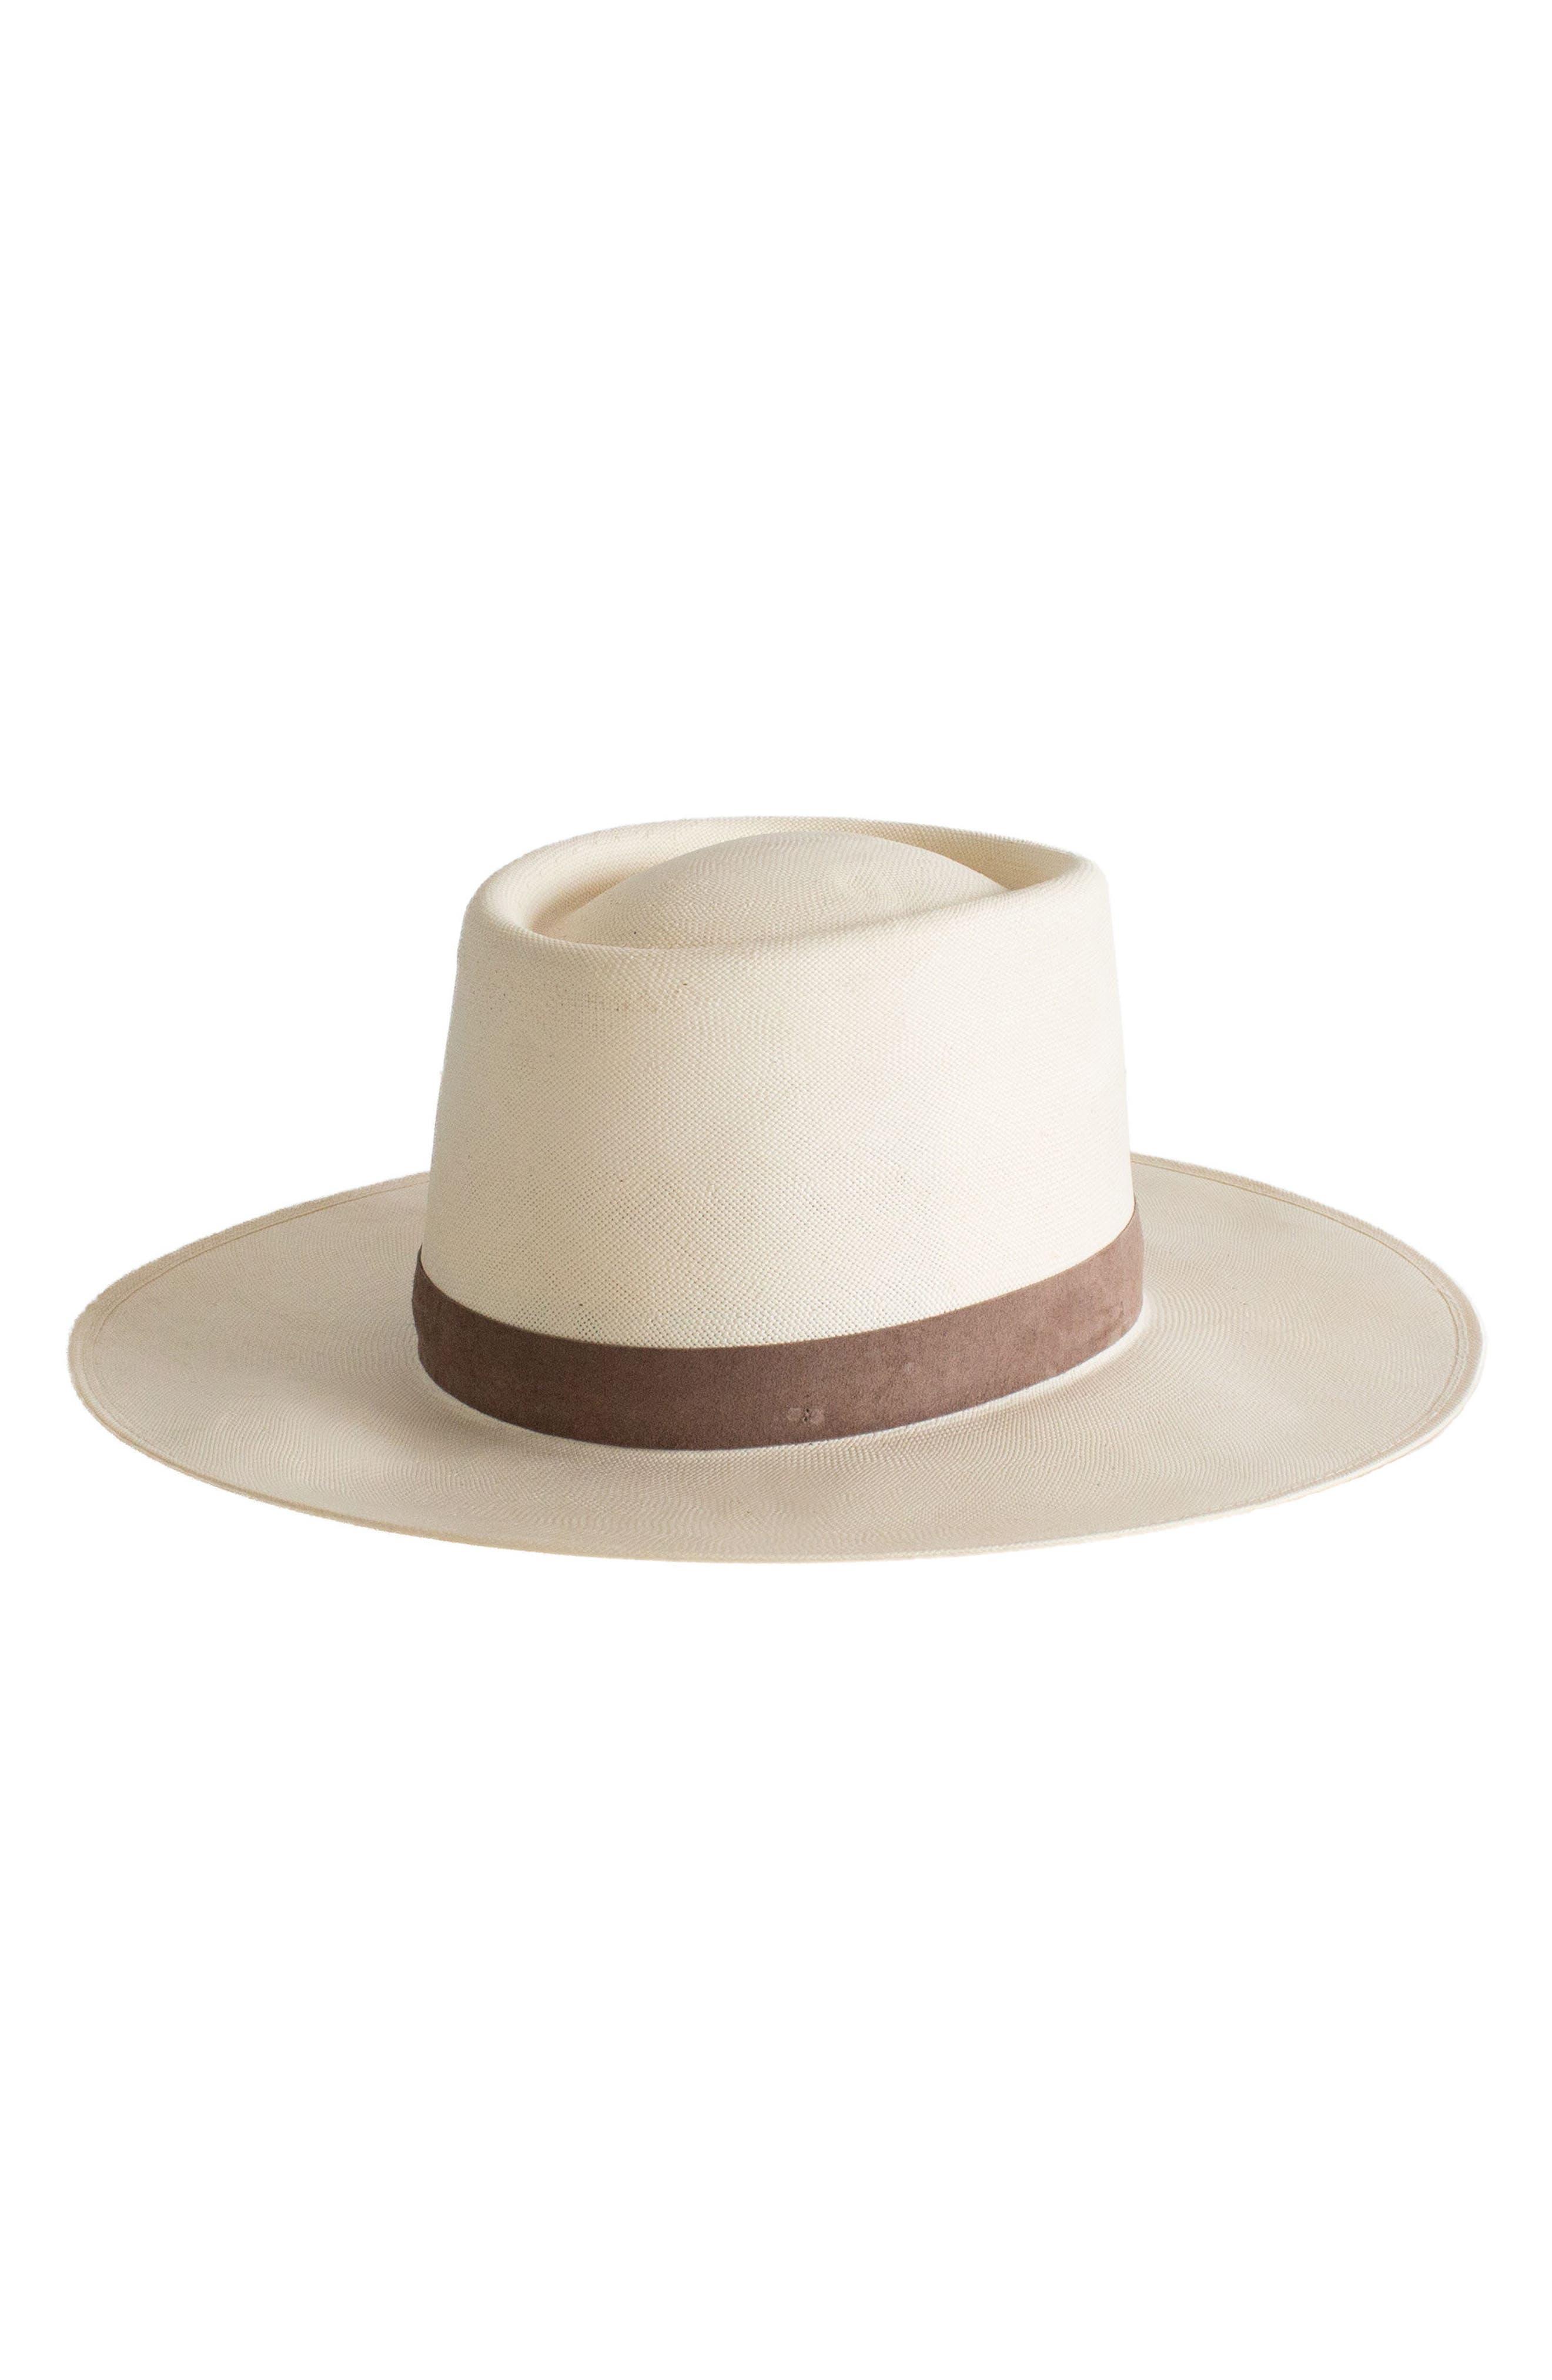 Alternate Image 1 Selected - Janessa Leone Shea Straw Hat